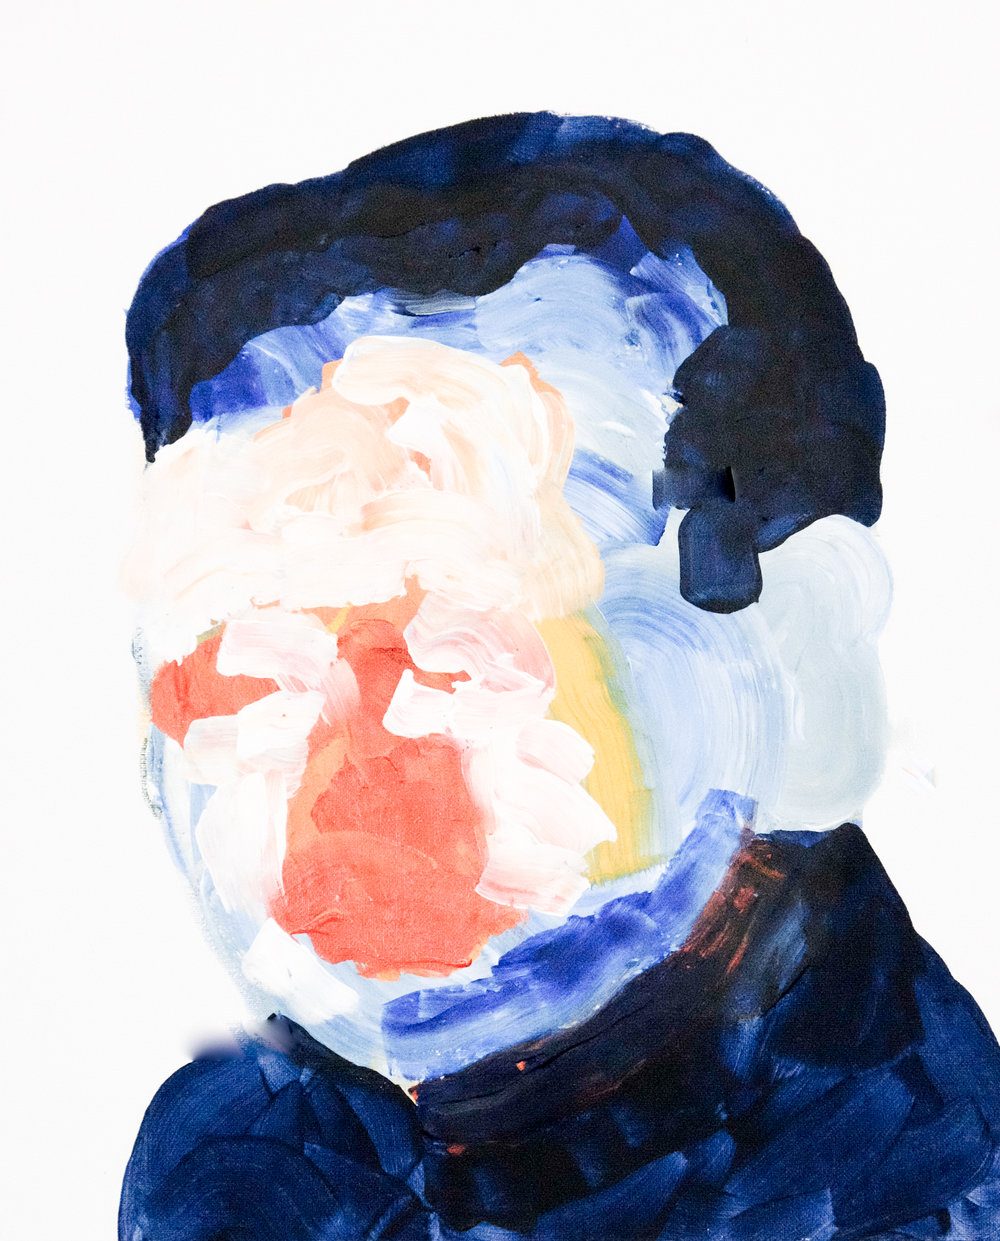 Self portrait no. 1,2017, acrylic on canvas, 405mm x 510mm.